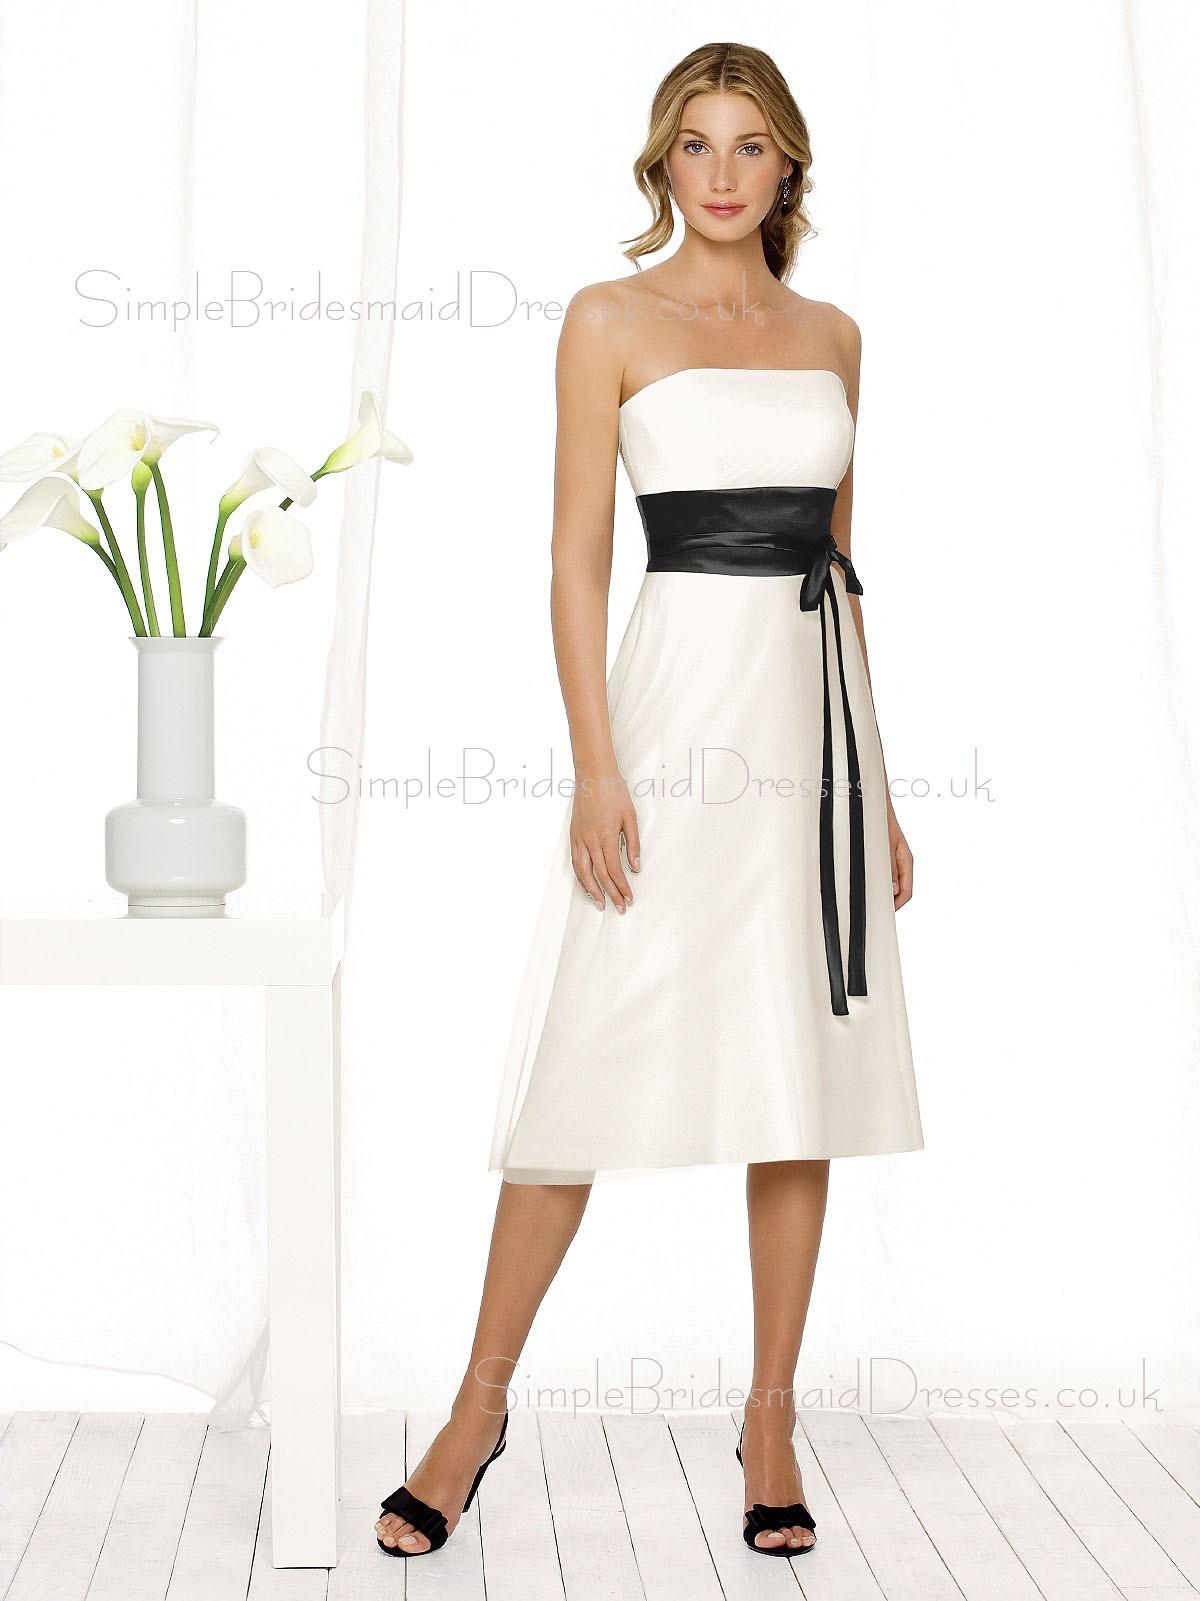 Ivory sleeveless knee length strapless empire bridesmaid for Ivory knee length wedding dresses